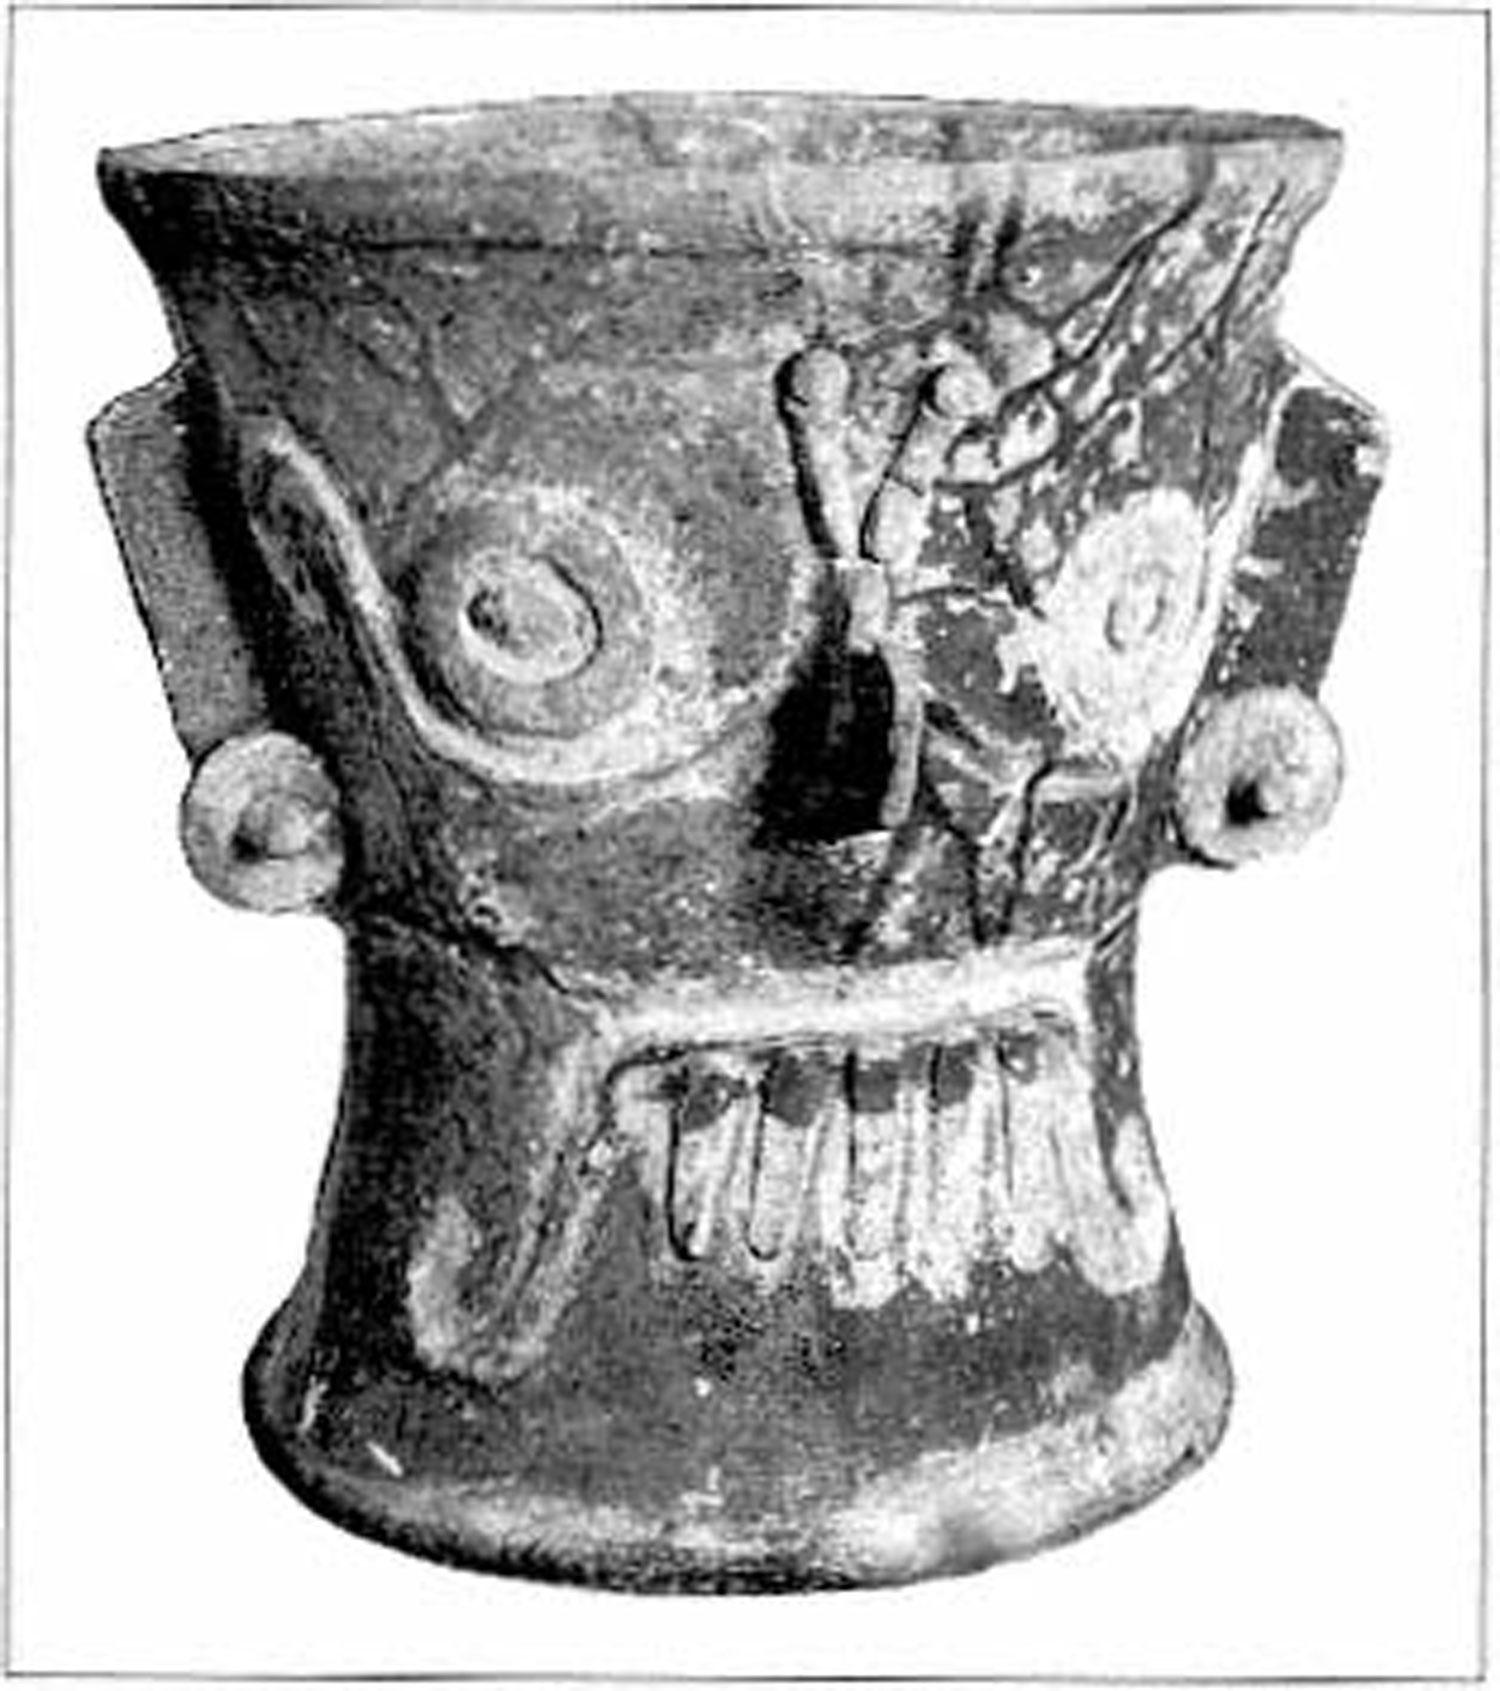 Chac/Tlaloc, painted ceramic urn, Balankanché Cave, Yucatán. Source:  publishing.cdlib.org .